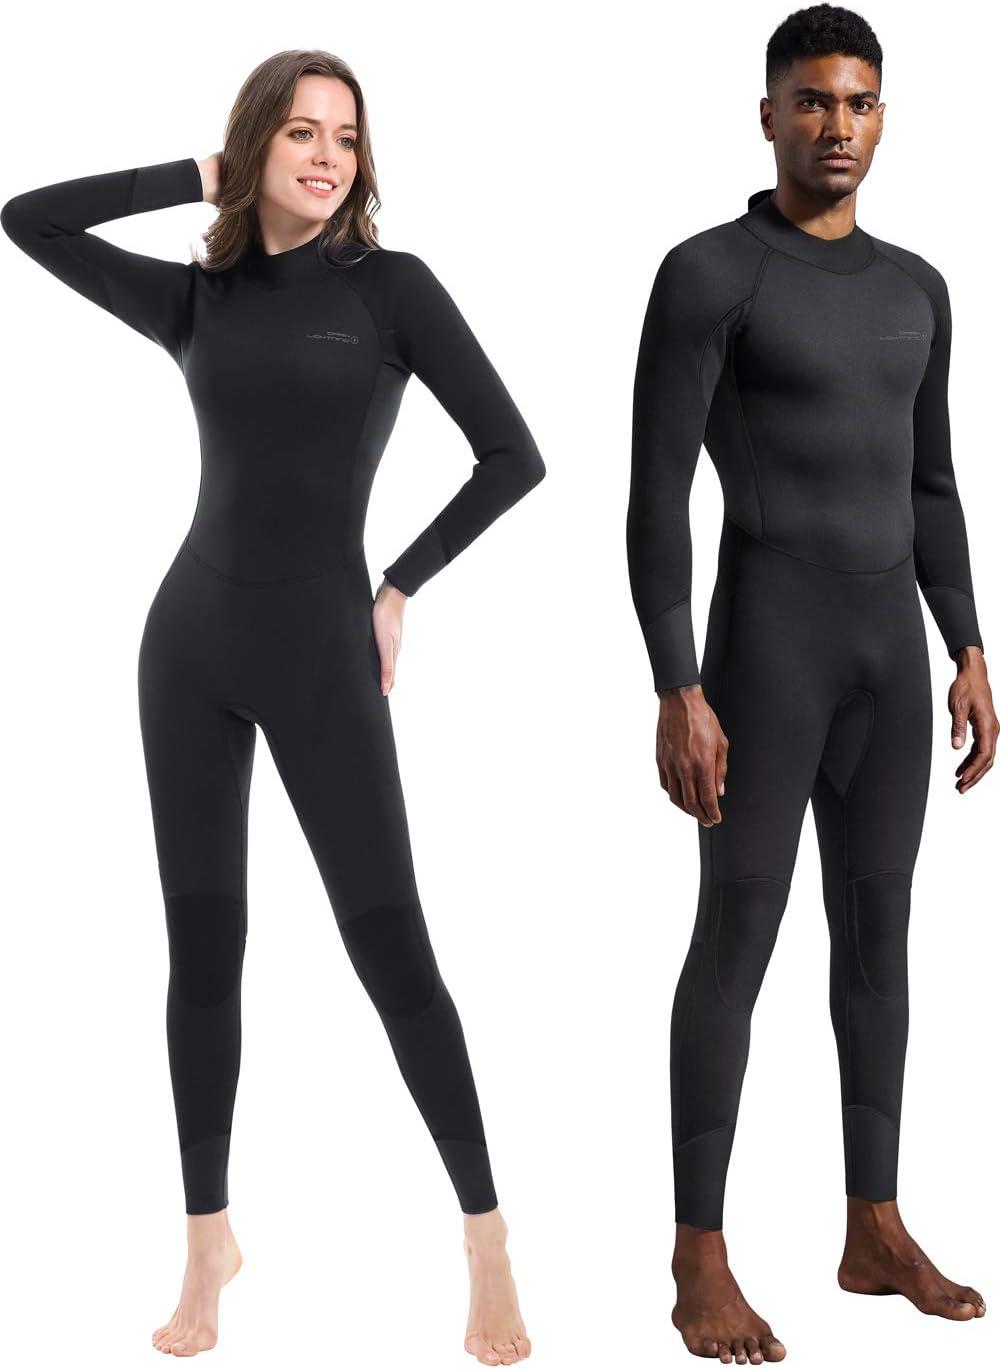 Dark Lightning Full Wetsuit Men and Women 3/2mm Wetsuit Women for Diving Surfing Snorkeling Kayaking